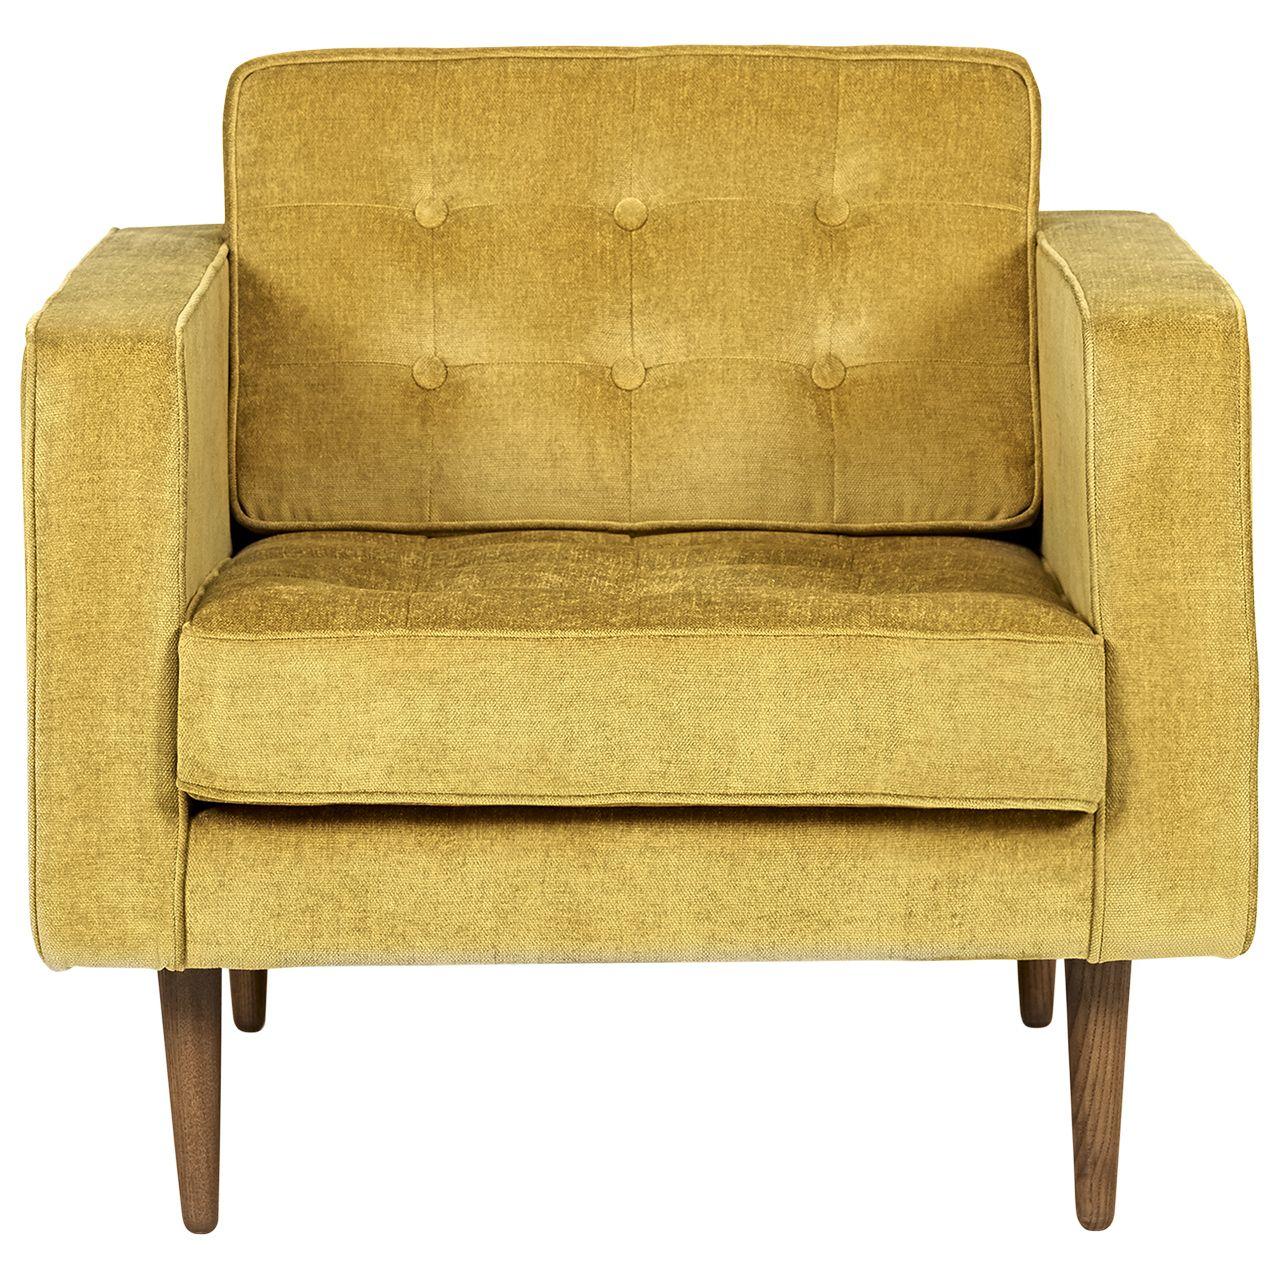 Mustard Capetown Chair